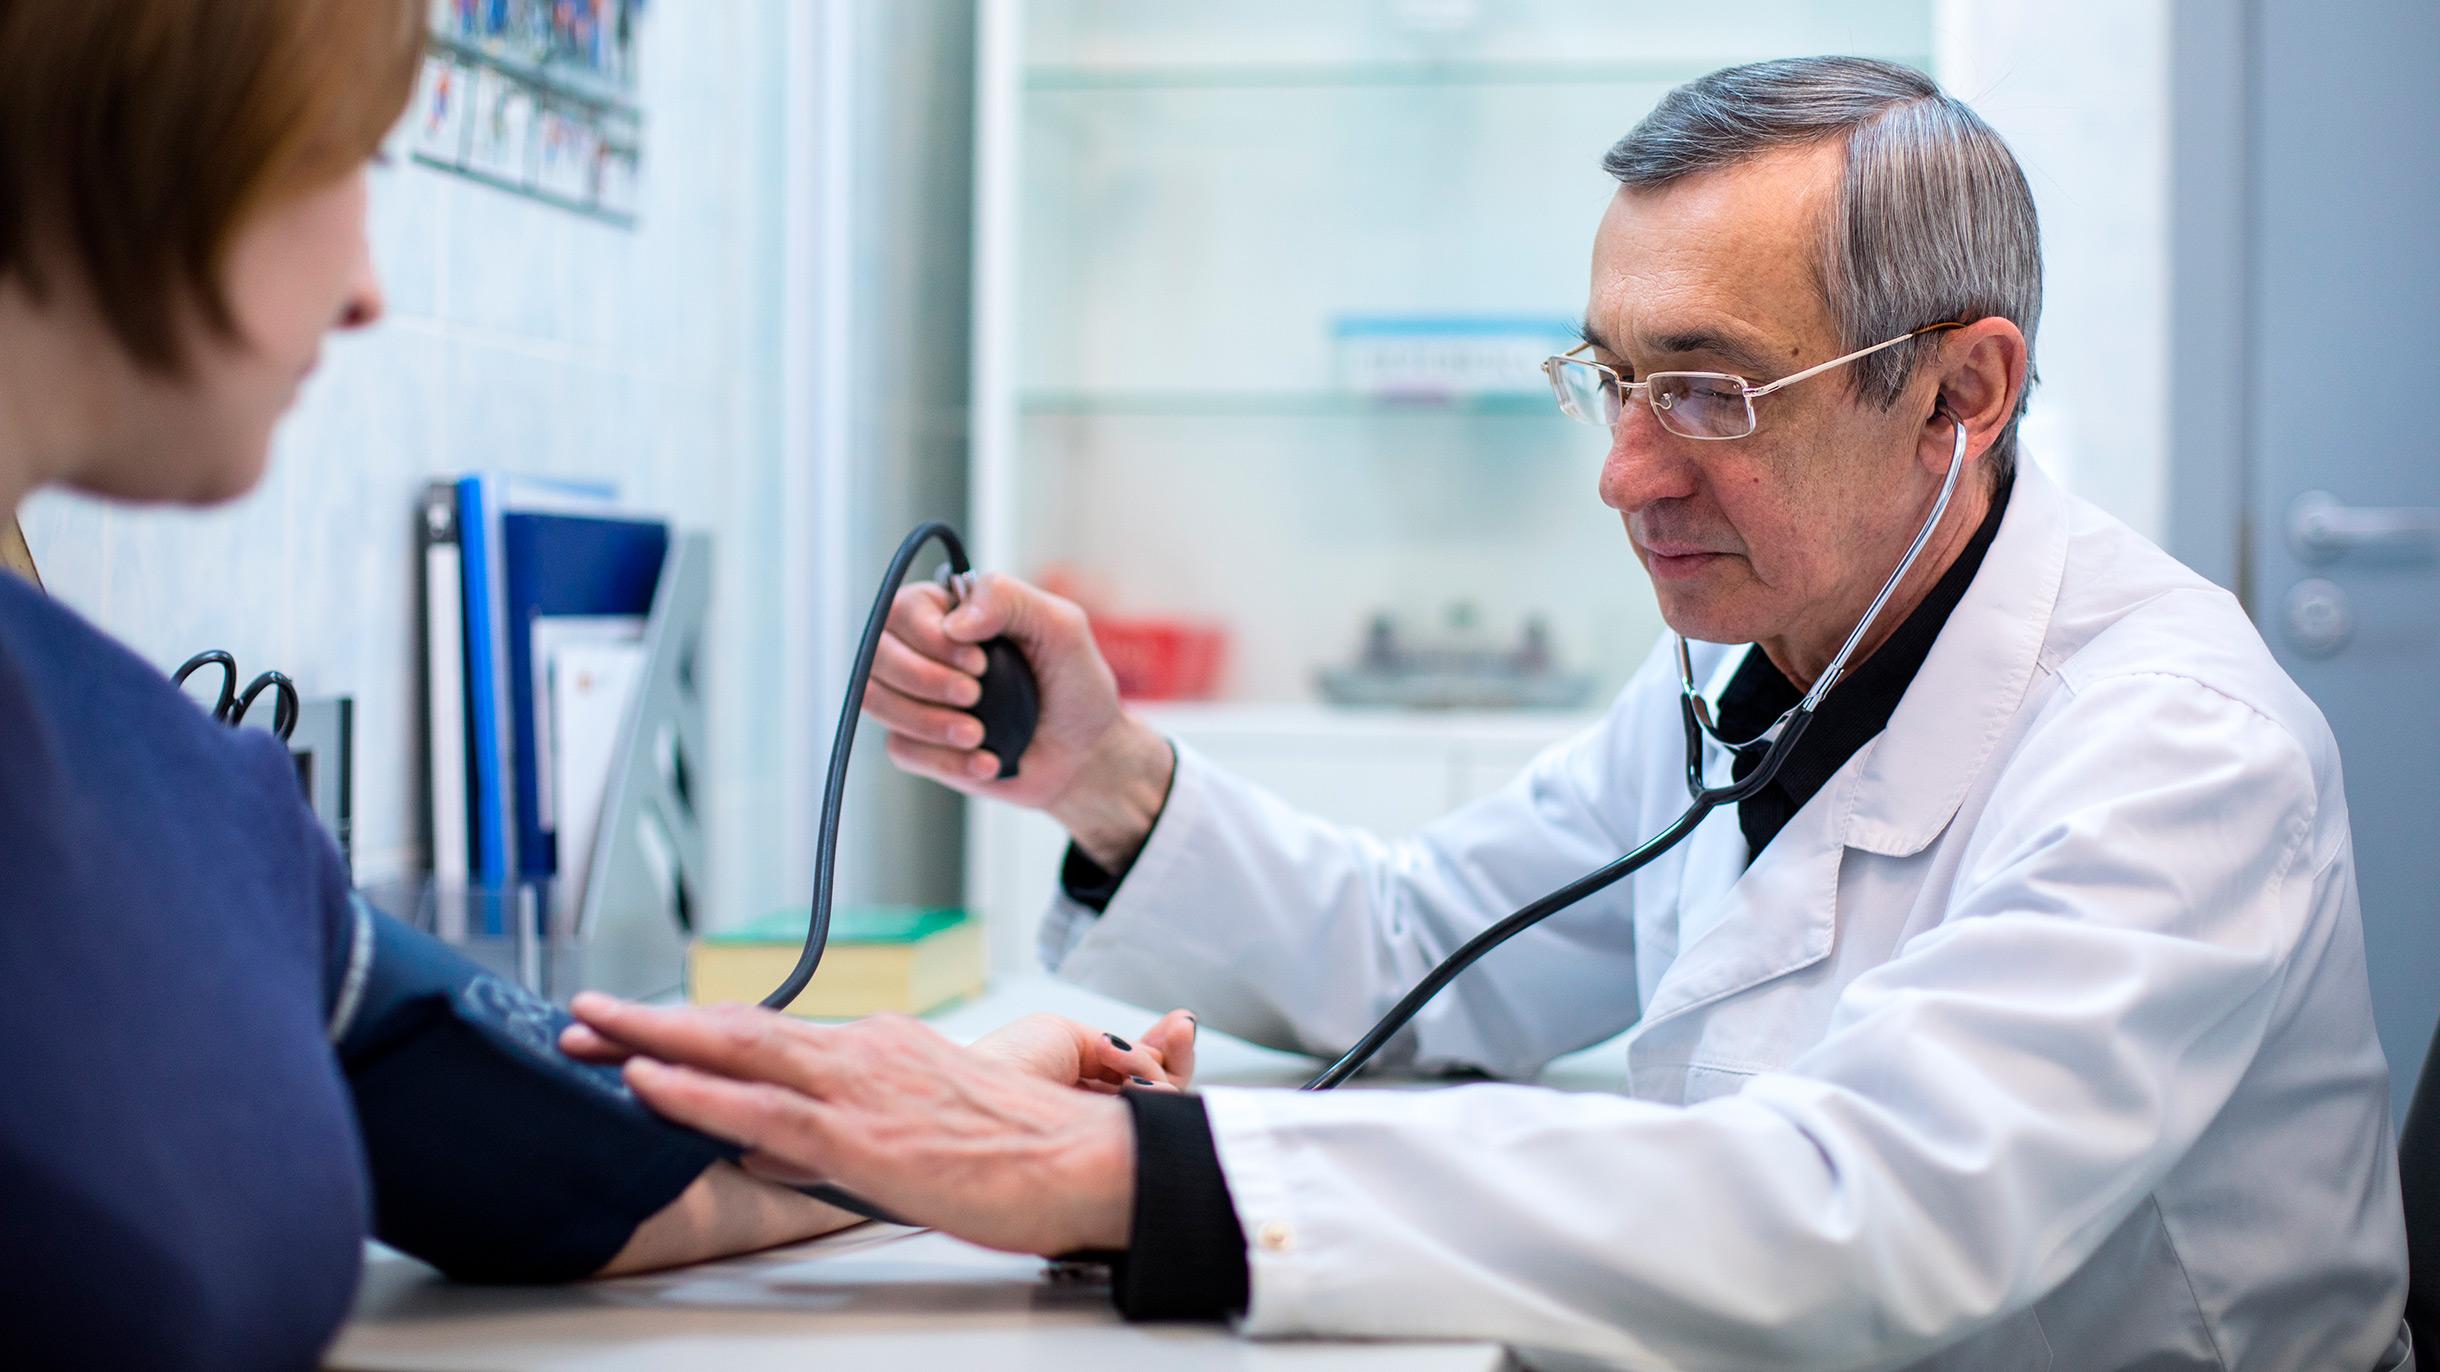 Бесплатную диспансеризацию отменили из-за коронавируса